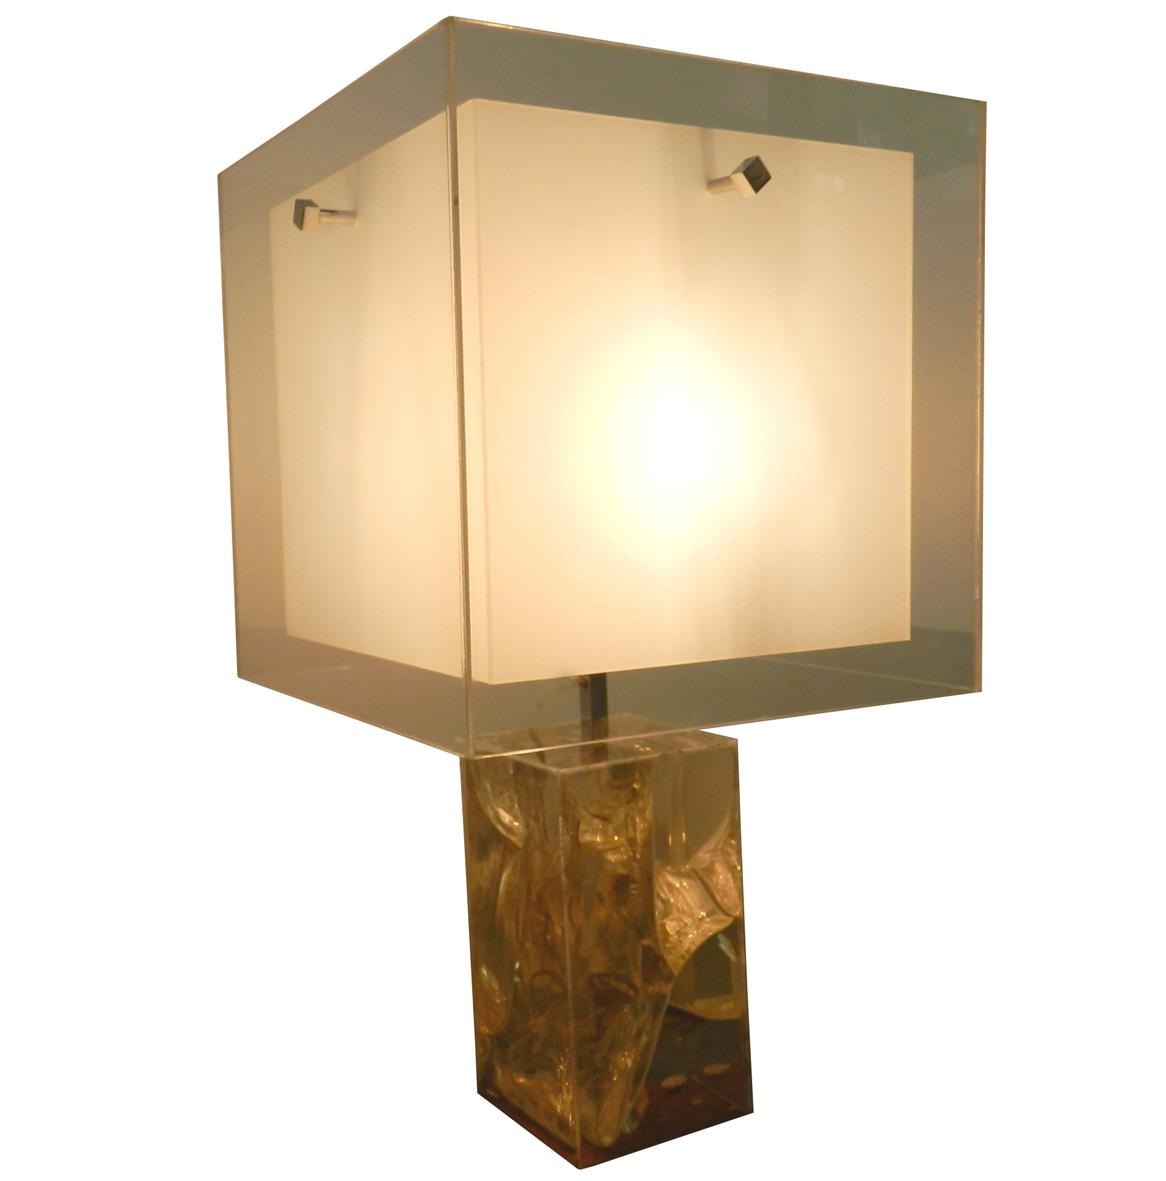 Pierre giraudon fractal resin table lamp modernism pierre giraudon fractal resin table lamp aloadofball Gallery